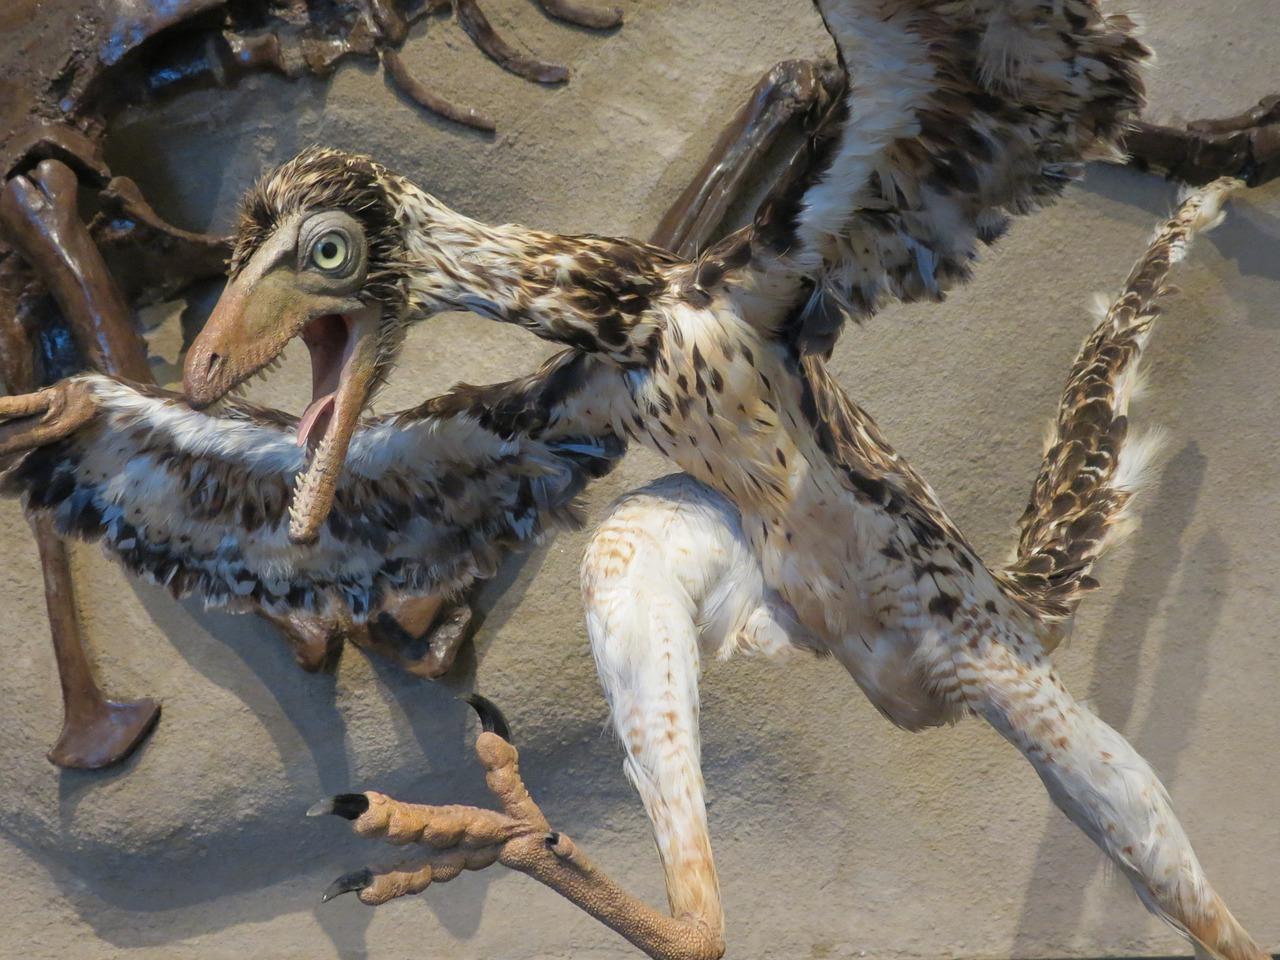 https://img.technews.tw/wp-content/uploads/2017/09/29111022/archaeopteryx-1645455_1280.jpg